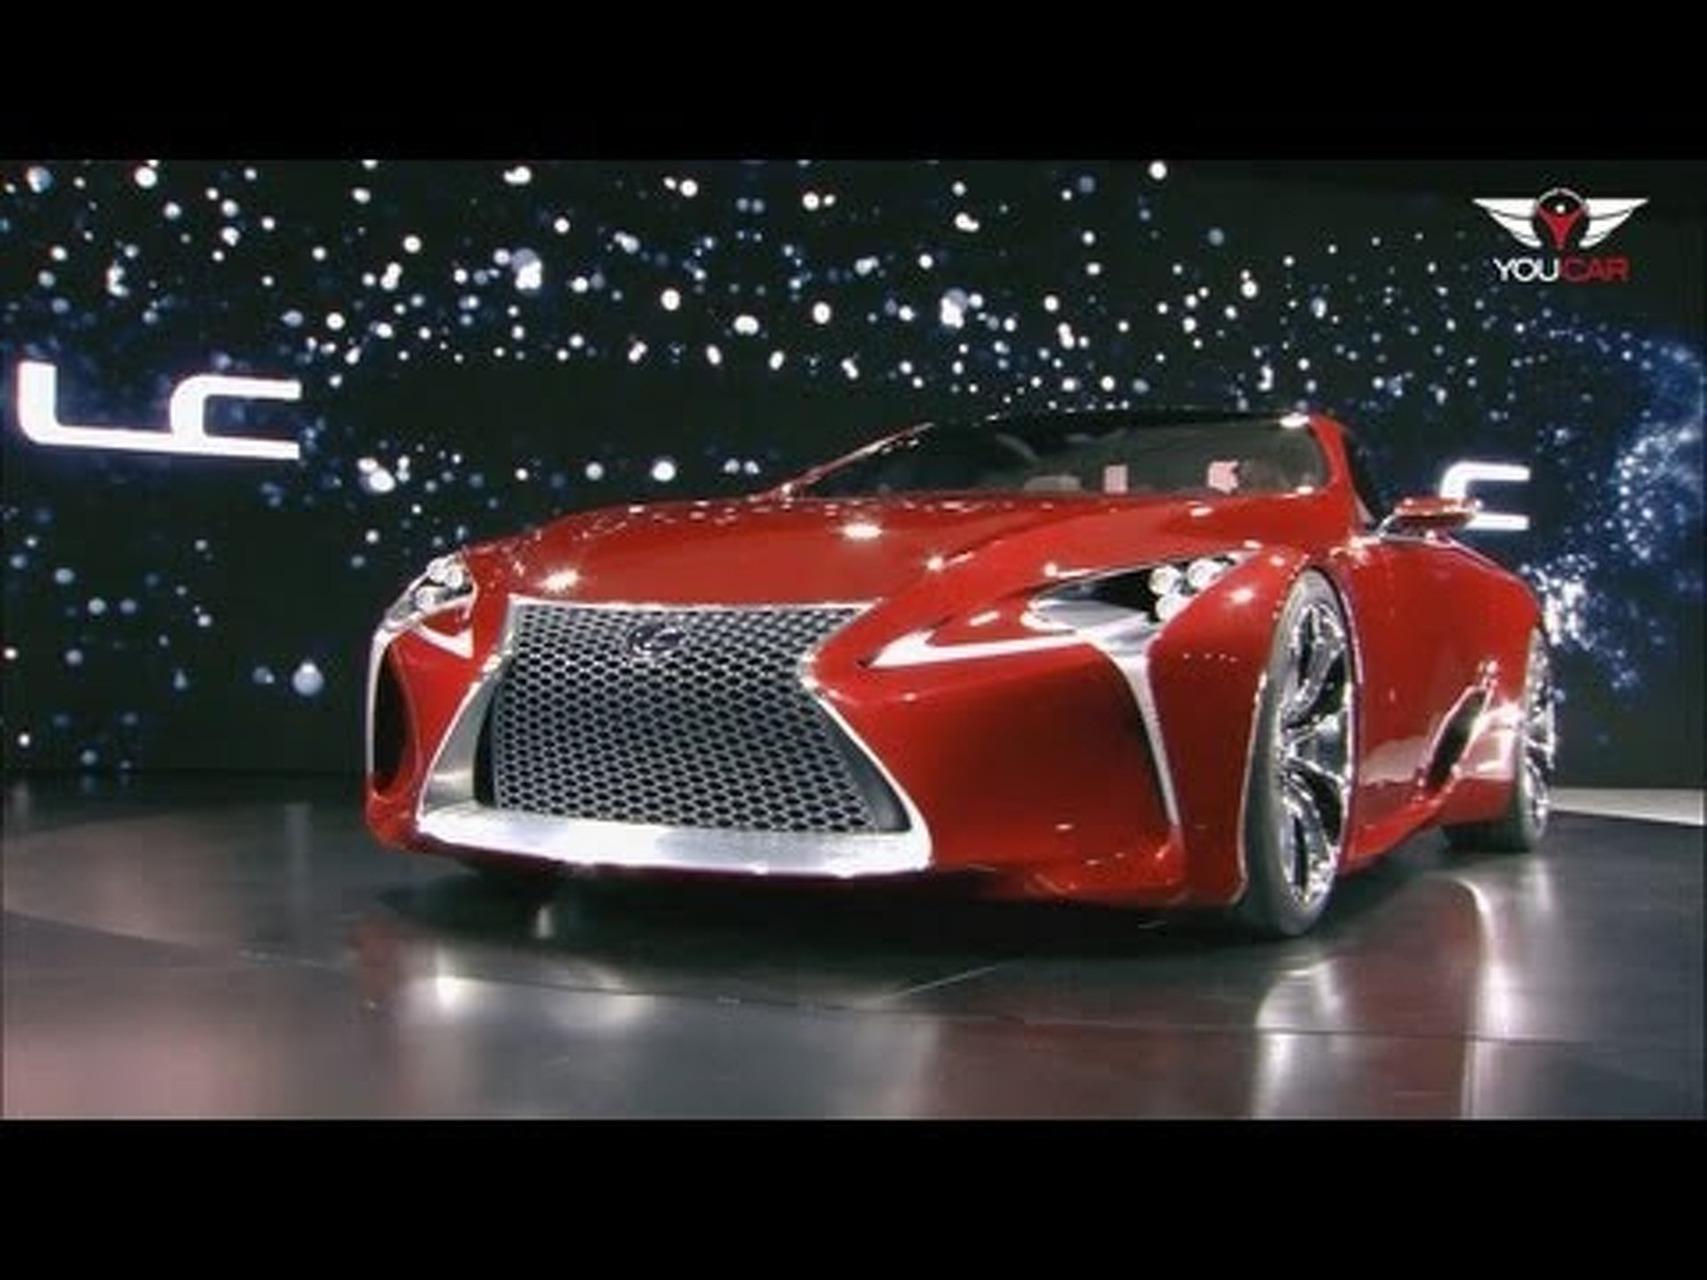 Lexus LF-LC Concept at 2012 NAIAS